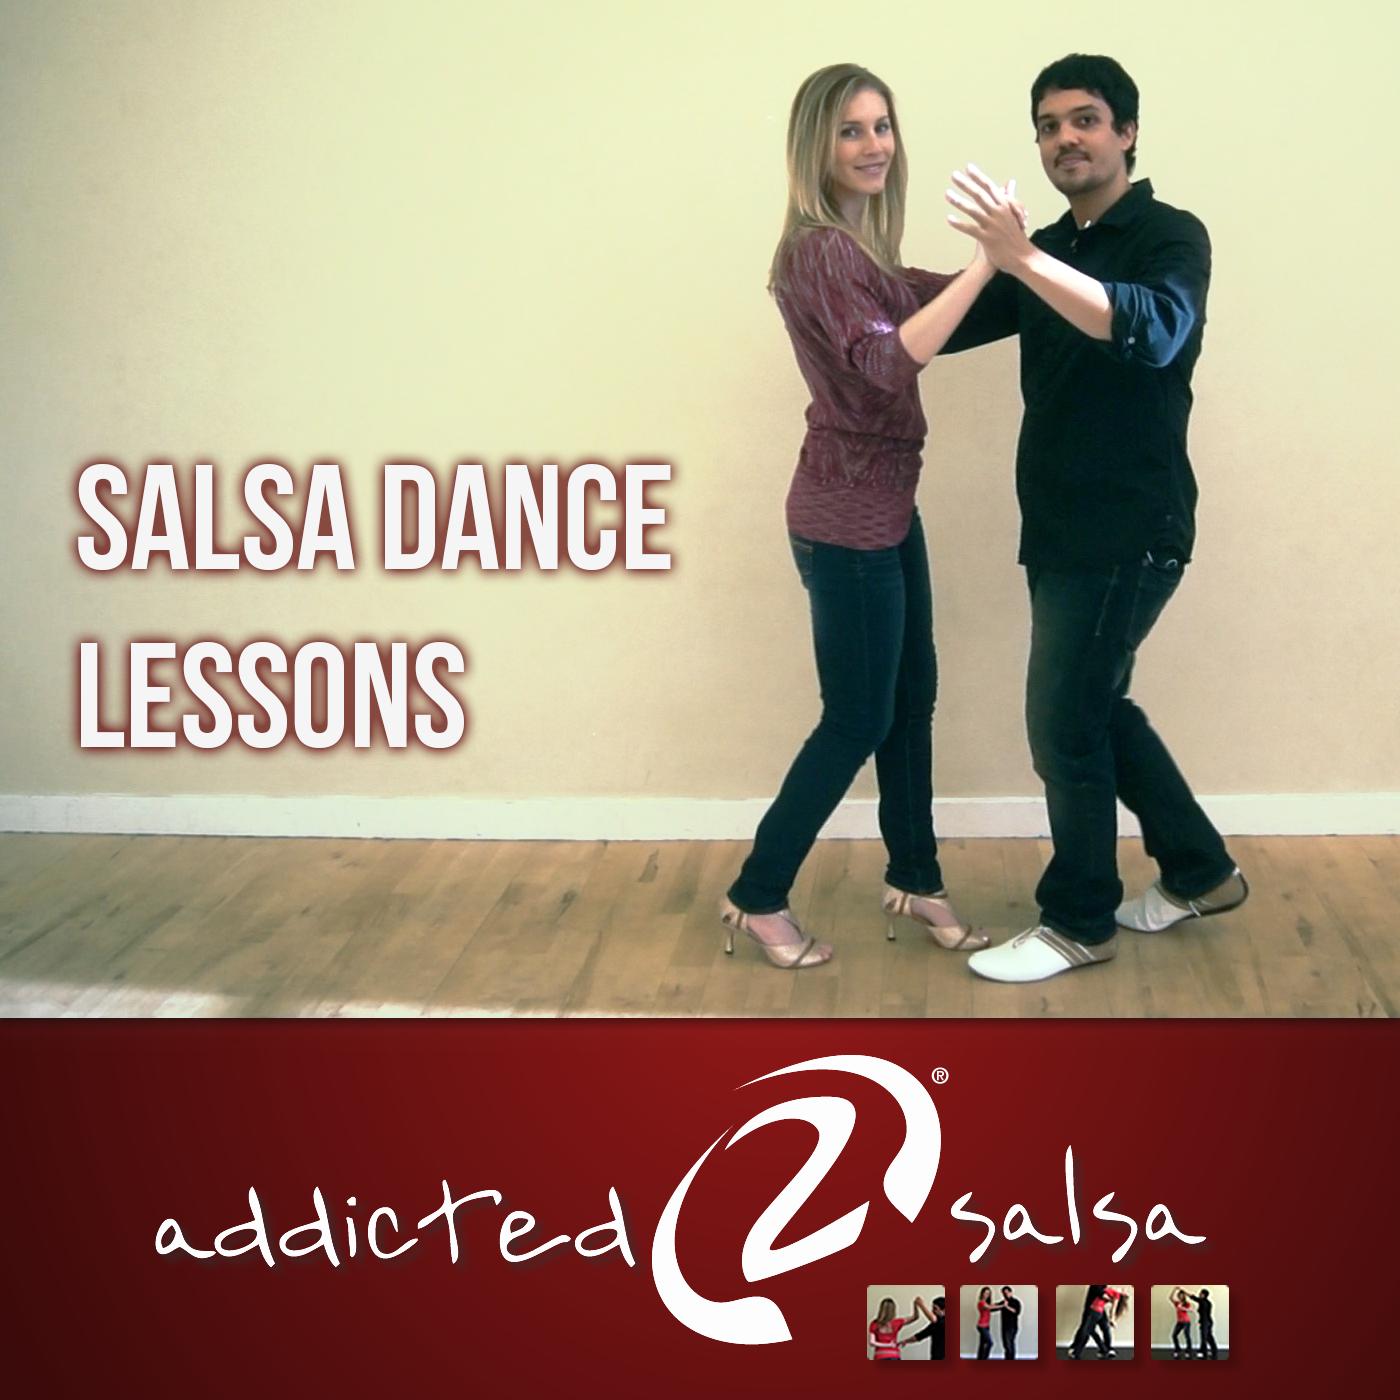 Addicted2Salsa : Free Salsa Dance Lesson Videos